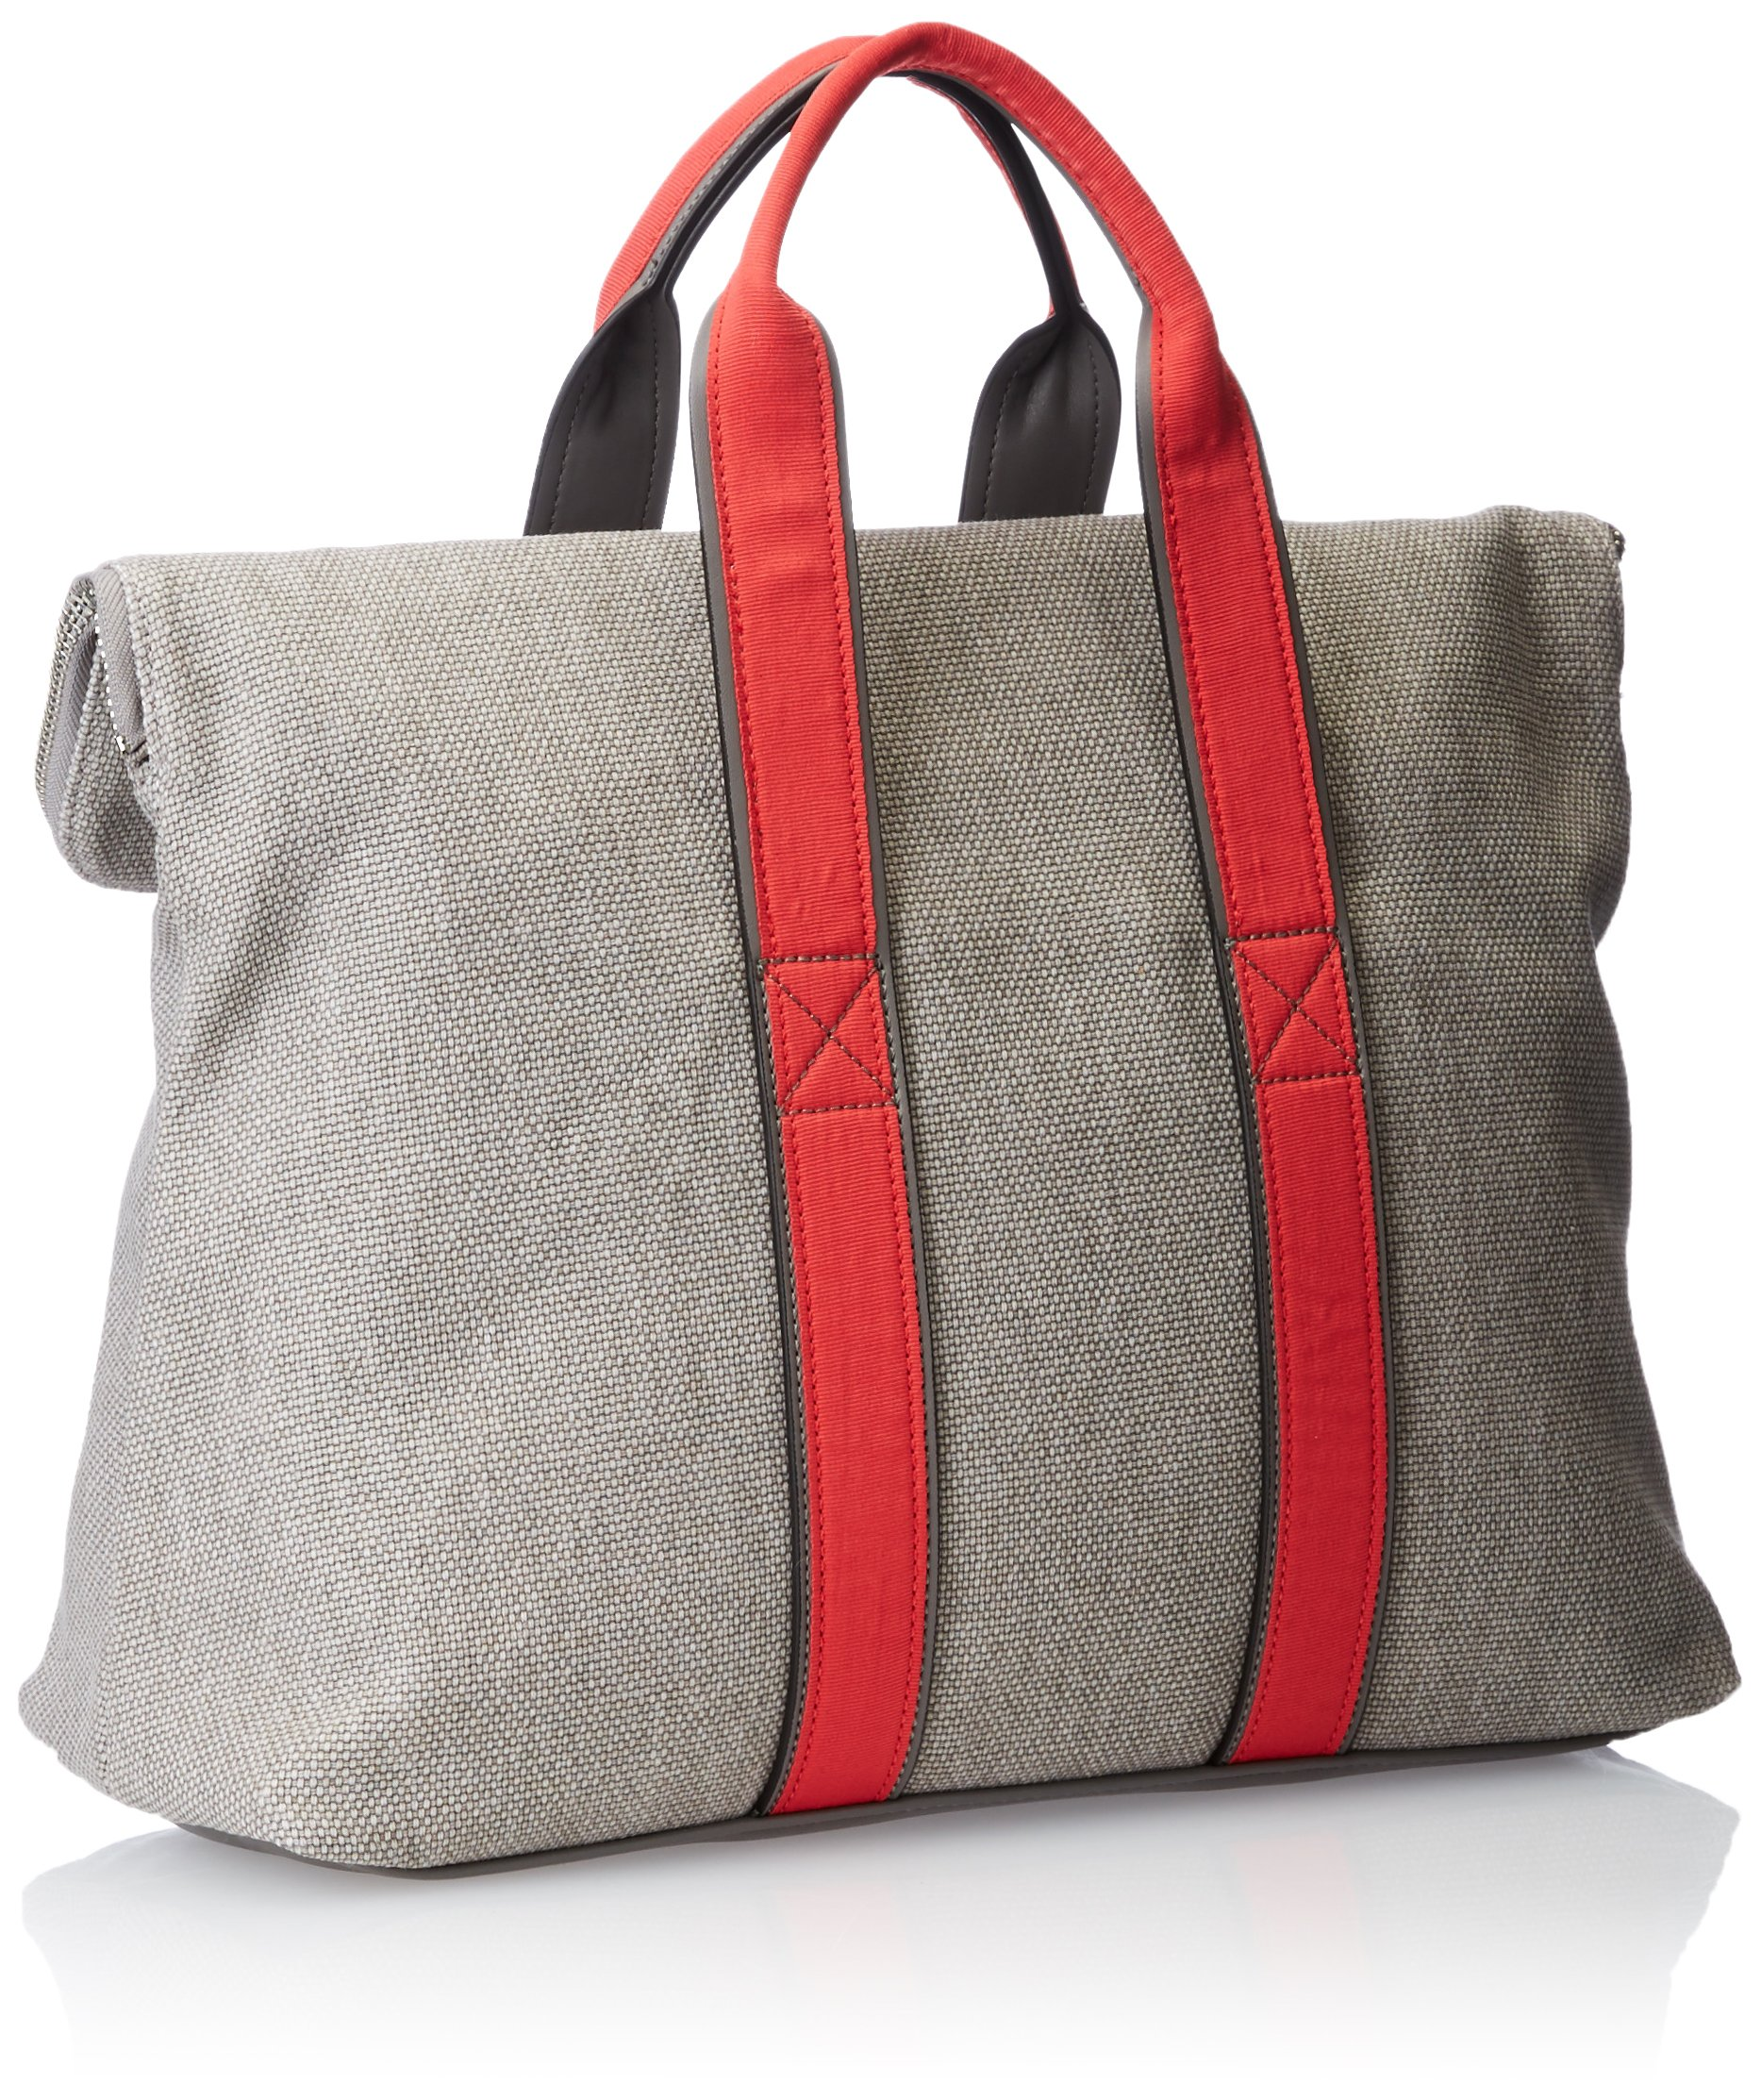 Splendid Cape May Satchel Top Handle Bag, Grey, One Size by Splendid (Image #2)